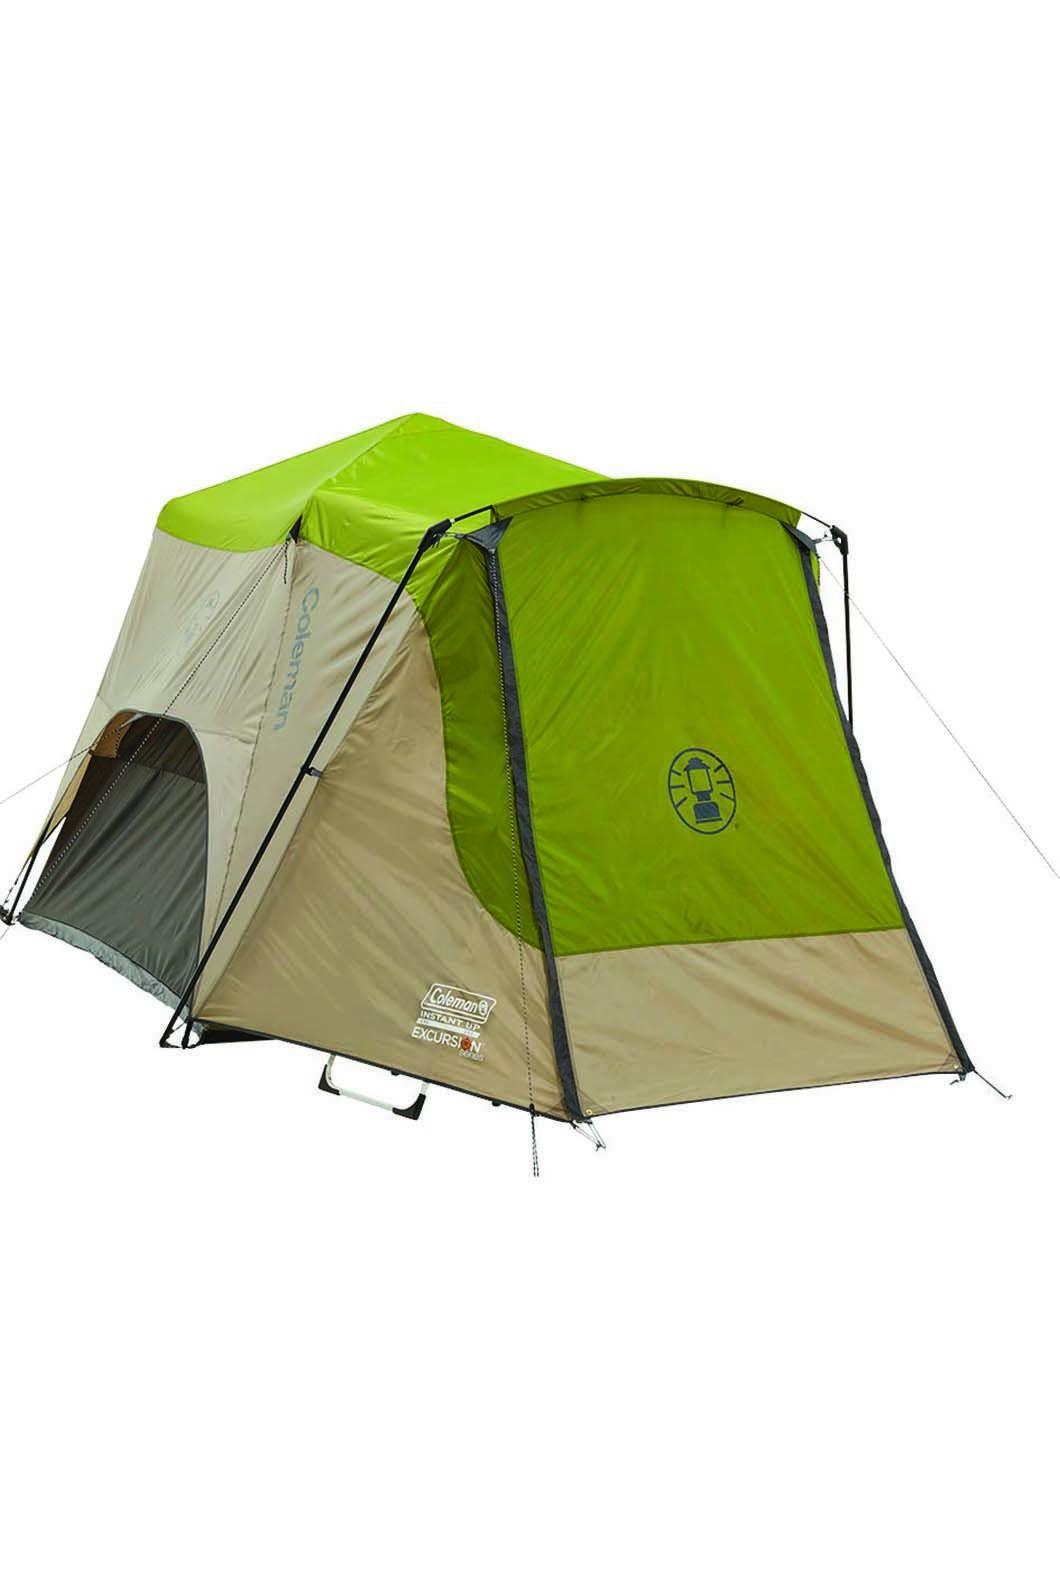 Coleman Excursion Instant Up 4 Person Touring Tent, None, hi-res